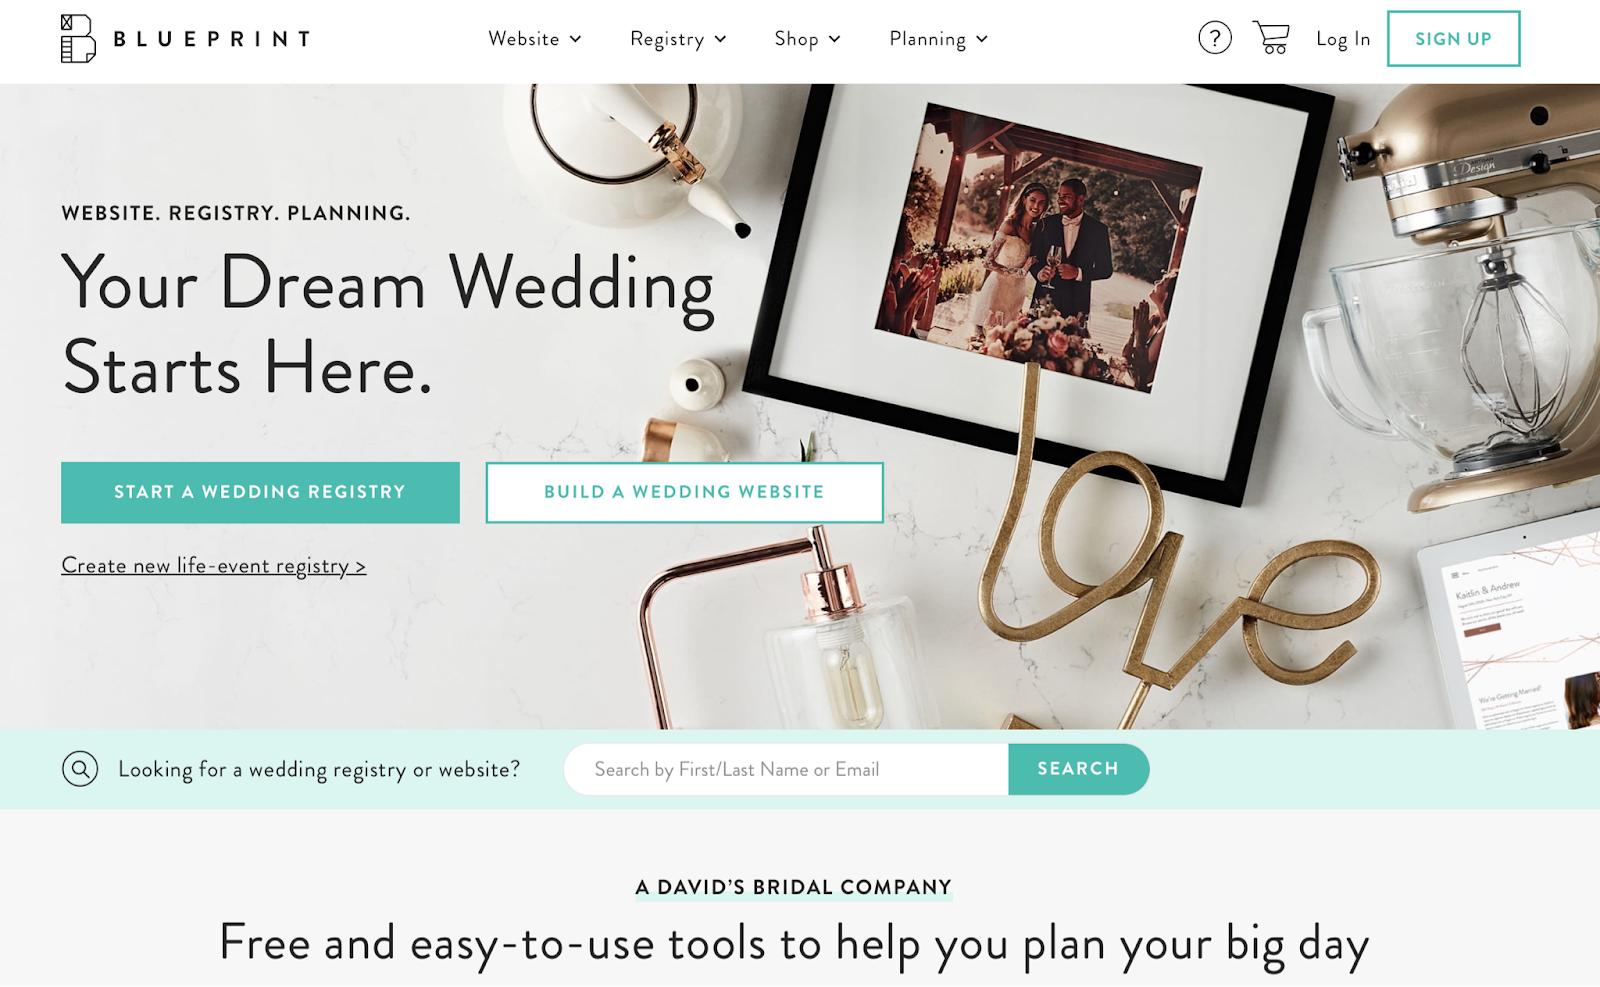 blueprint honeymoon registry